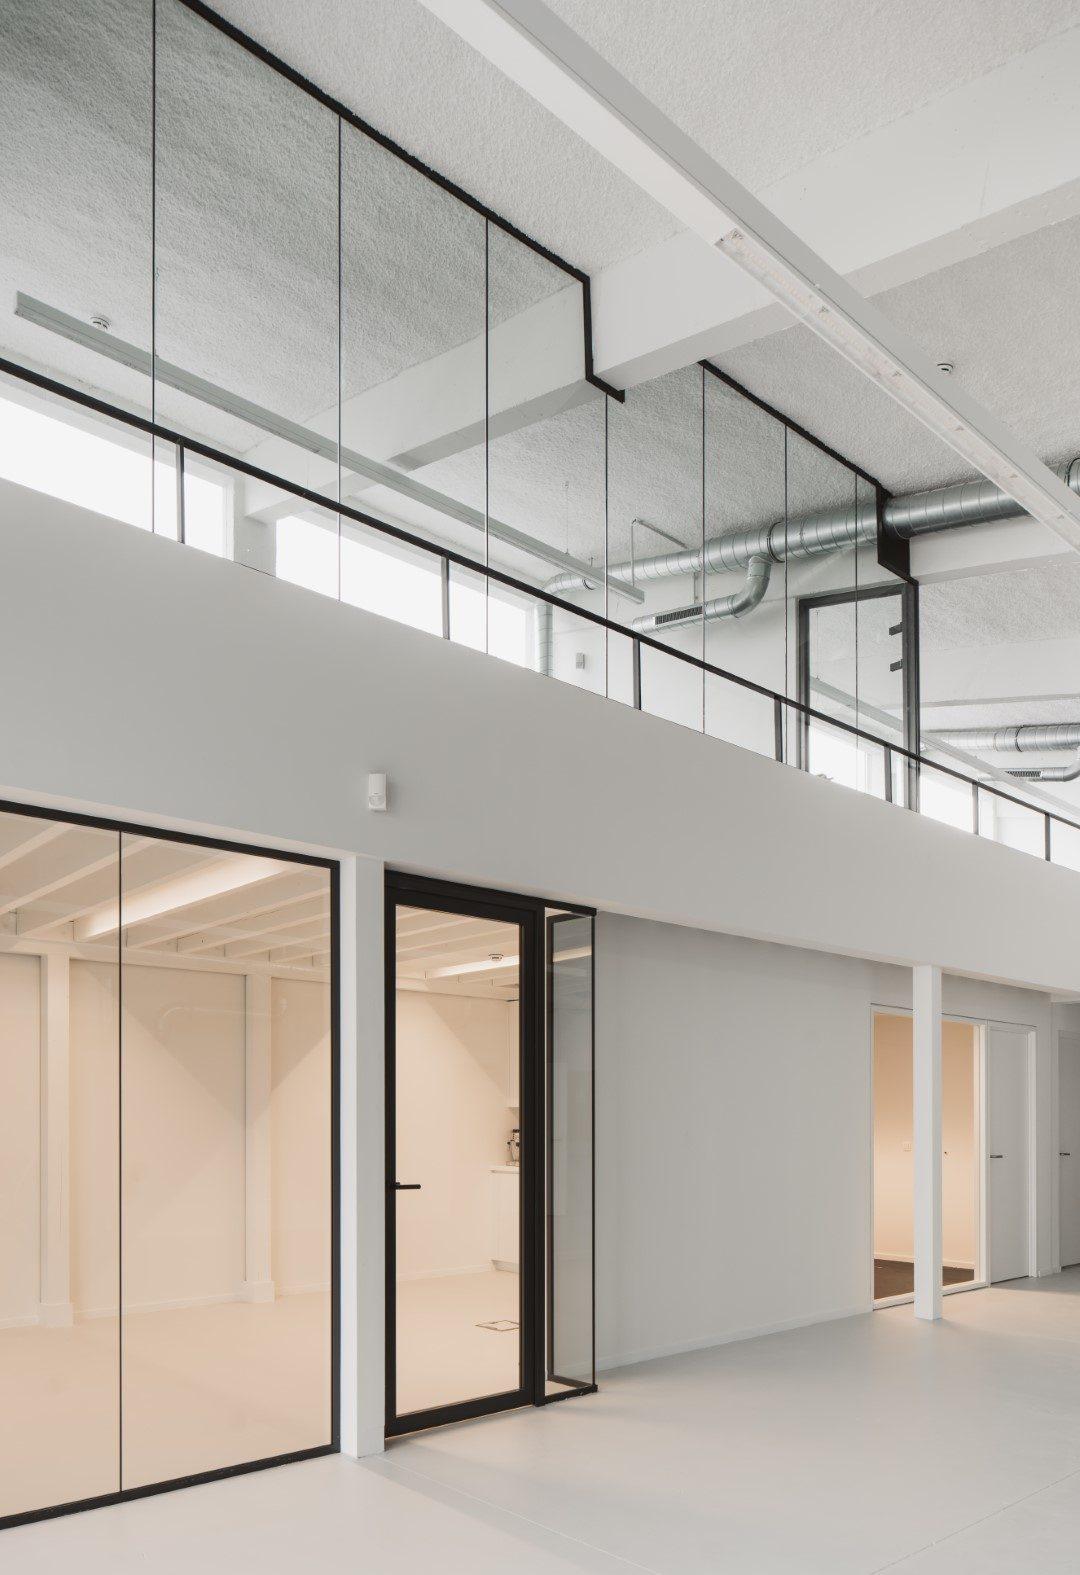 faktordertig - np bridging - leasinvest - architectuur - interieur - kantoor